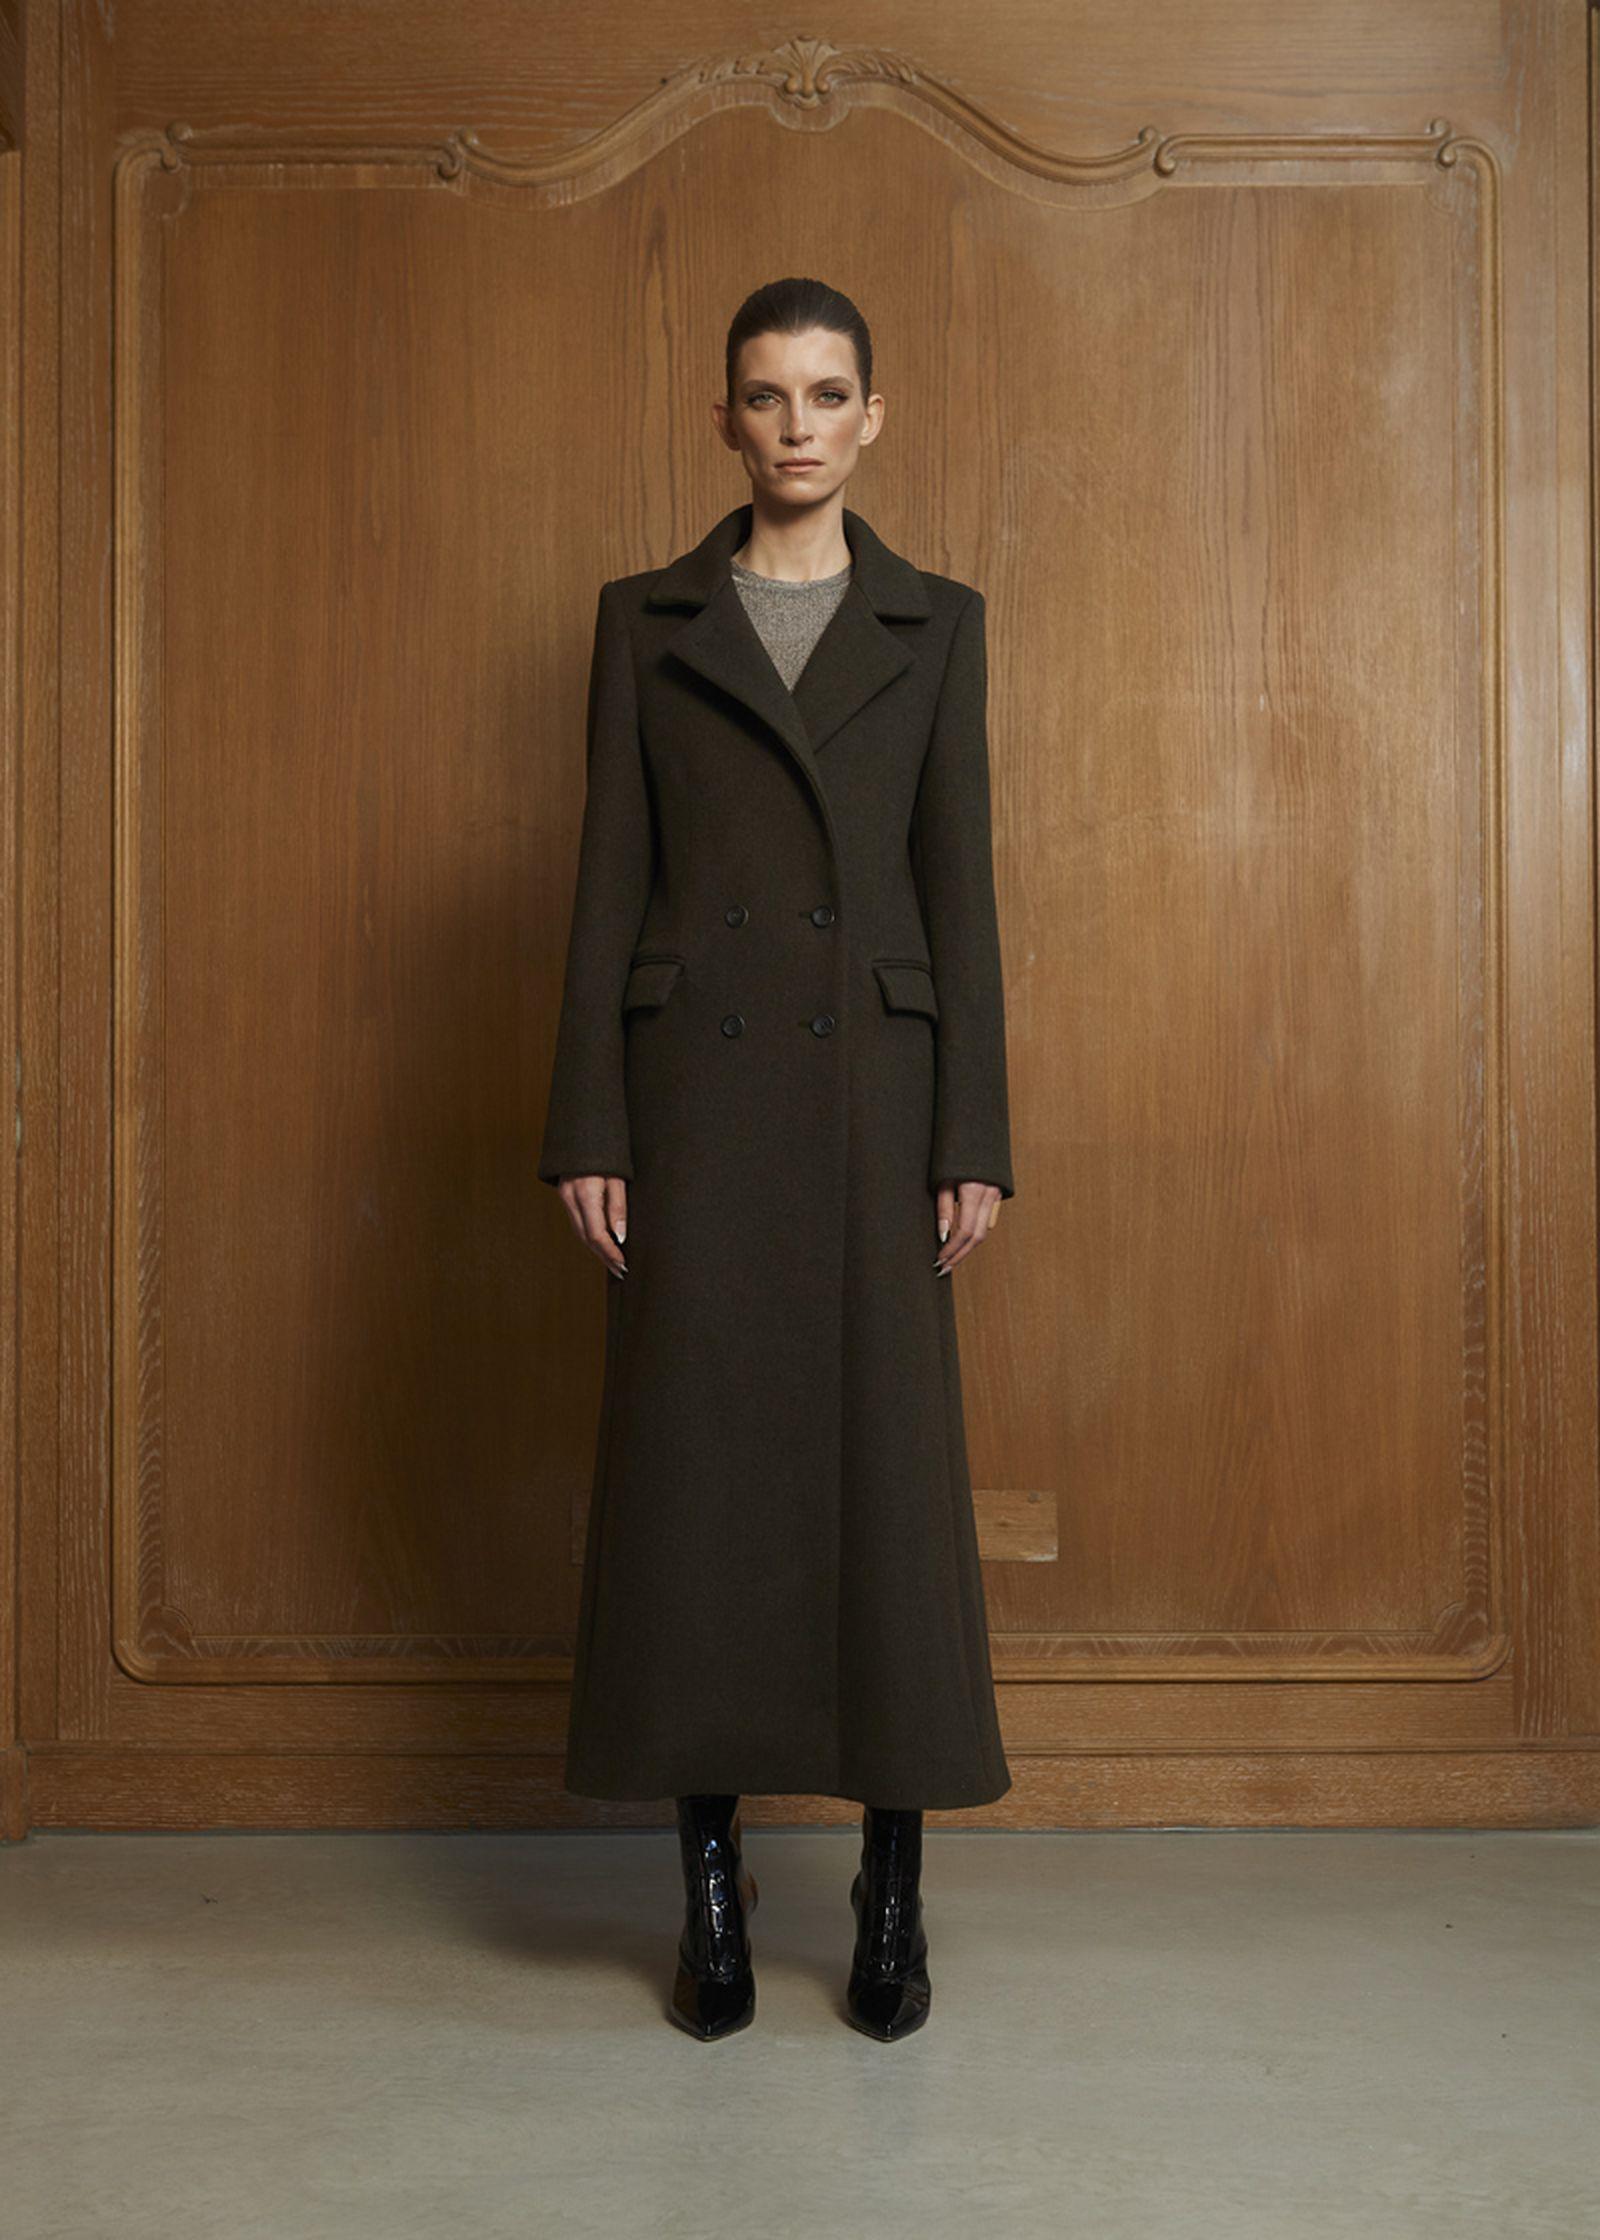 032c-rtw-womenswear-collection-paris-12